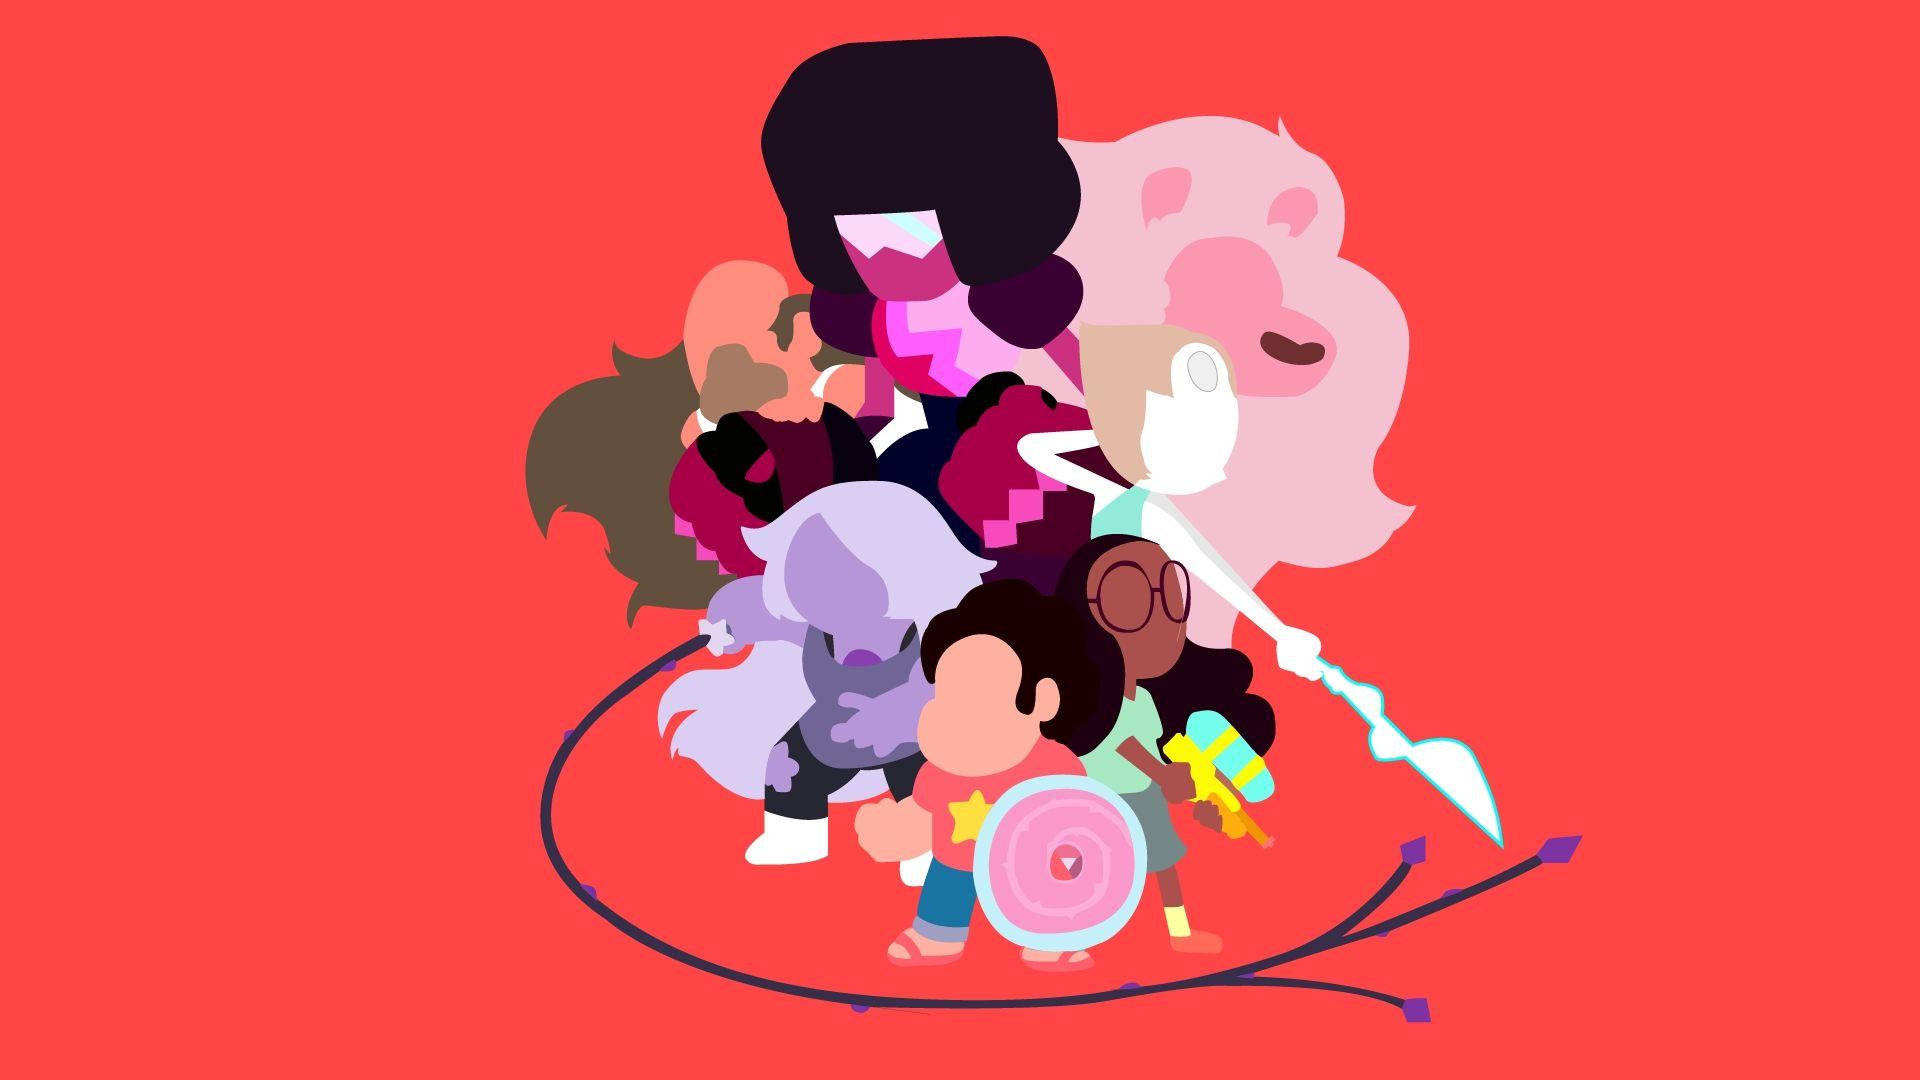 Free Download 10 Most Popular Steven Universe Minimalist